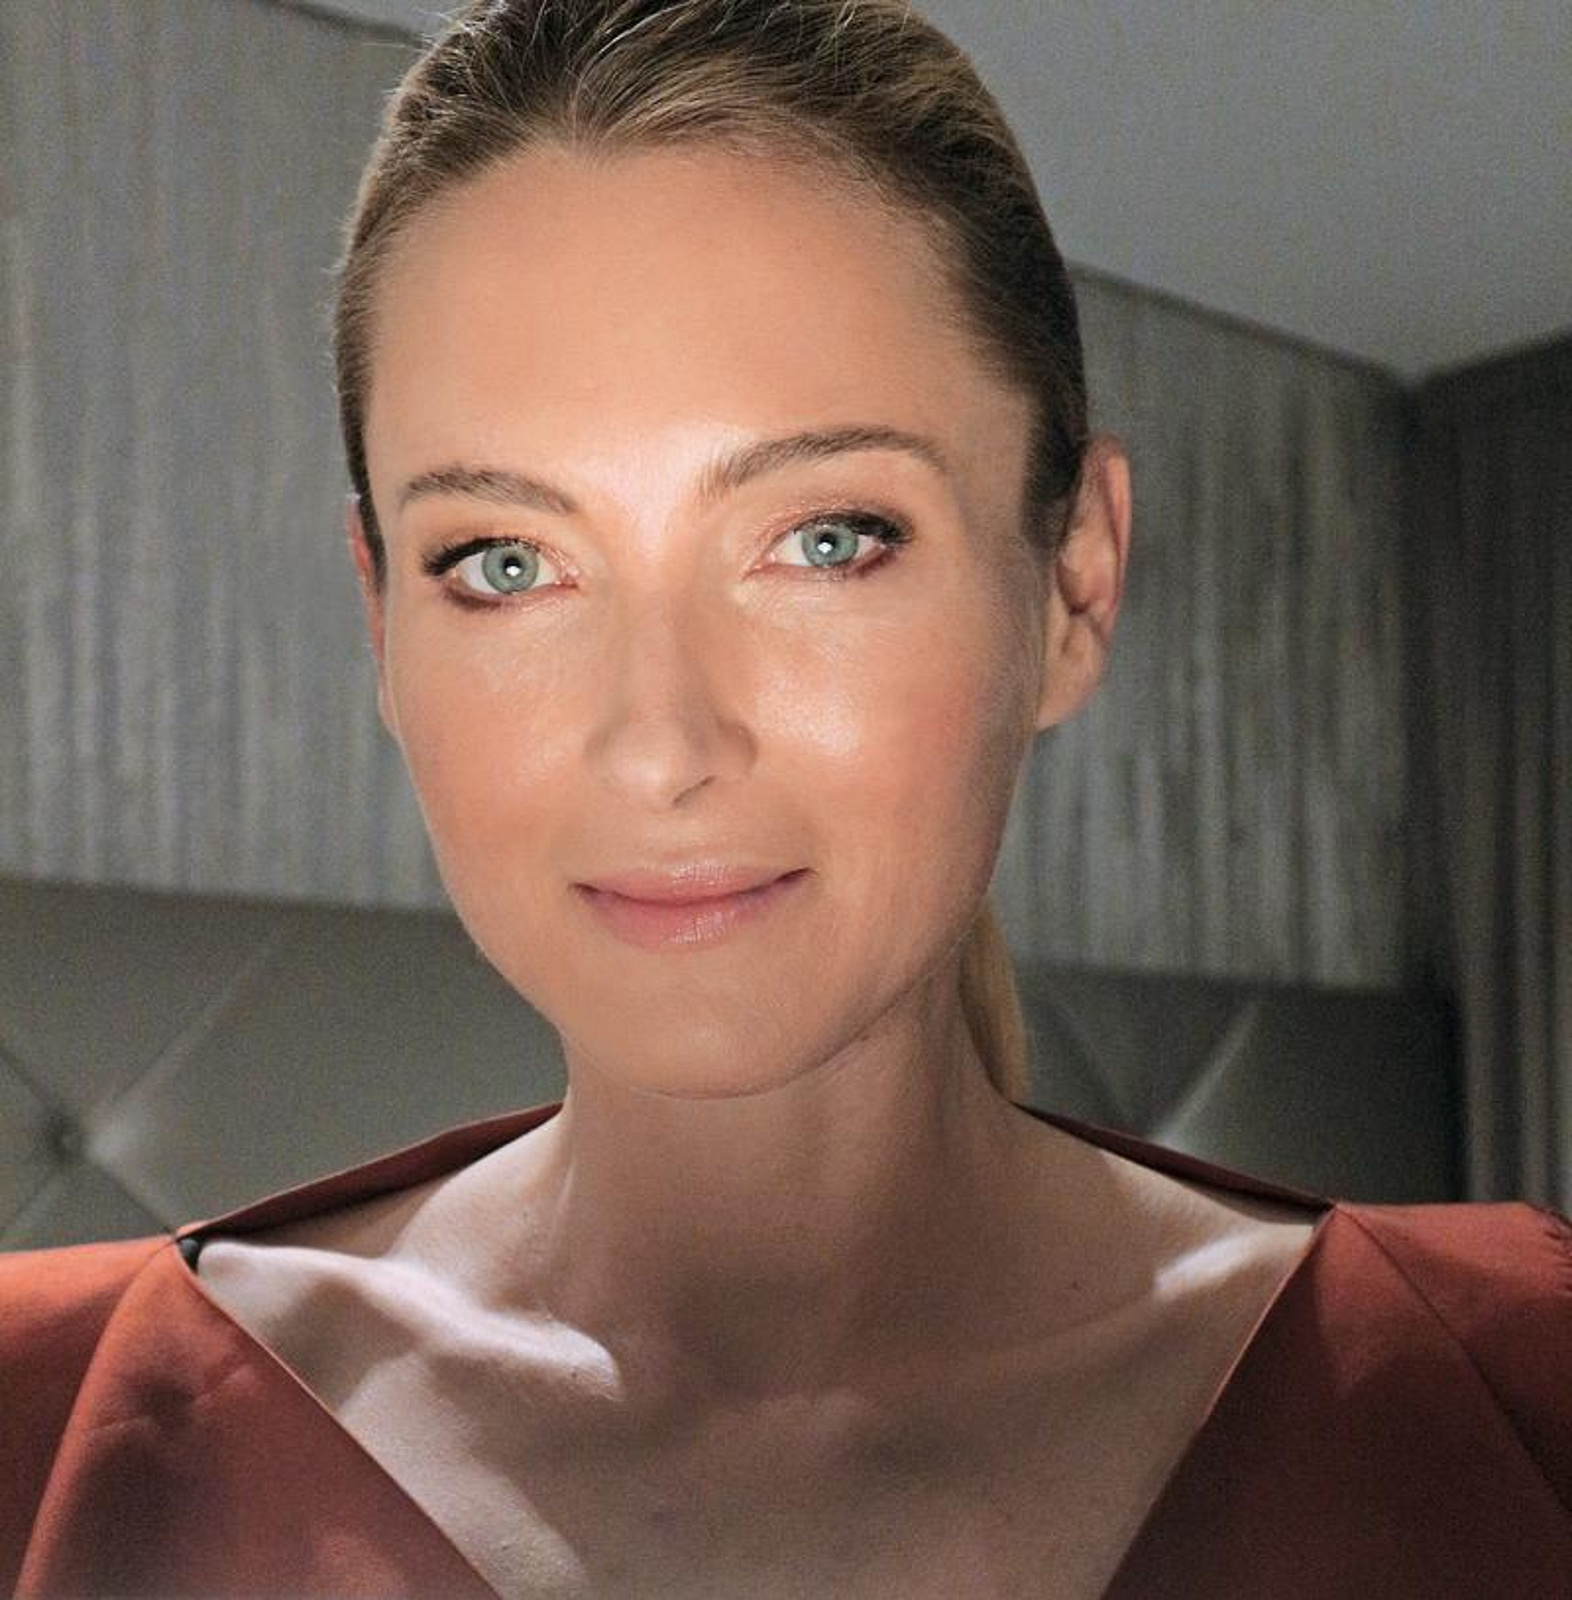 Prinzessin Lilly Zu Sayn Wittgenstein Berleburg Kosmetik International